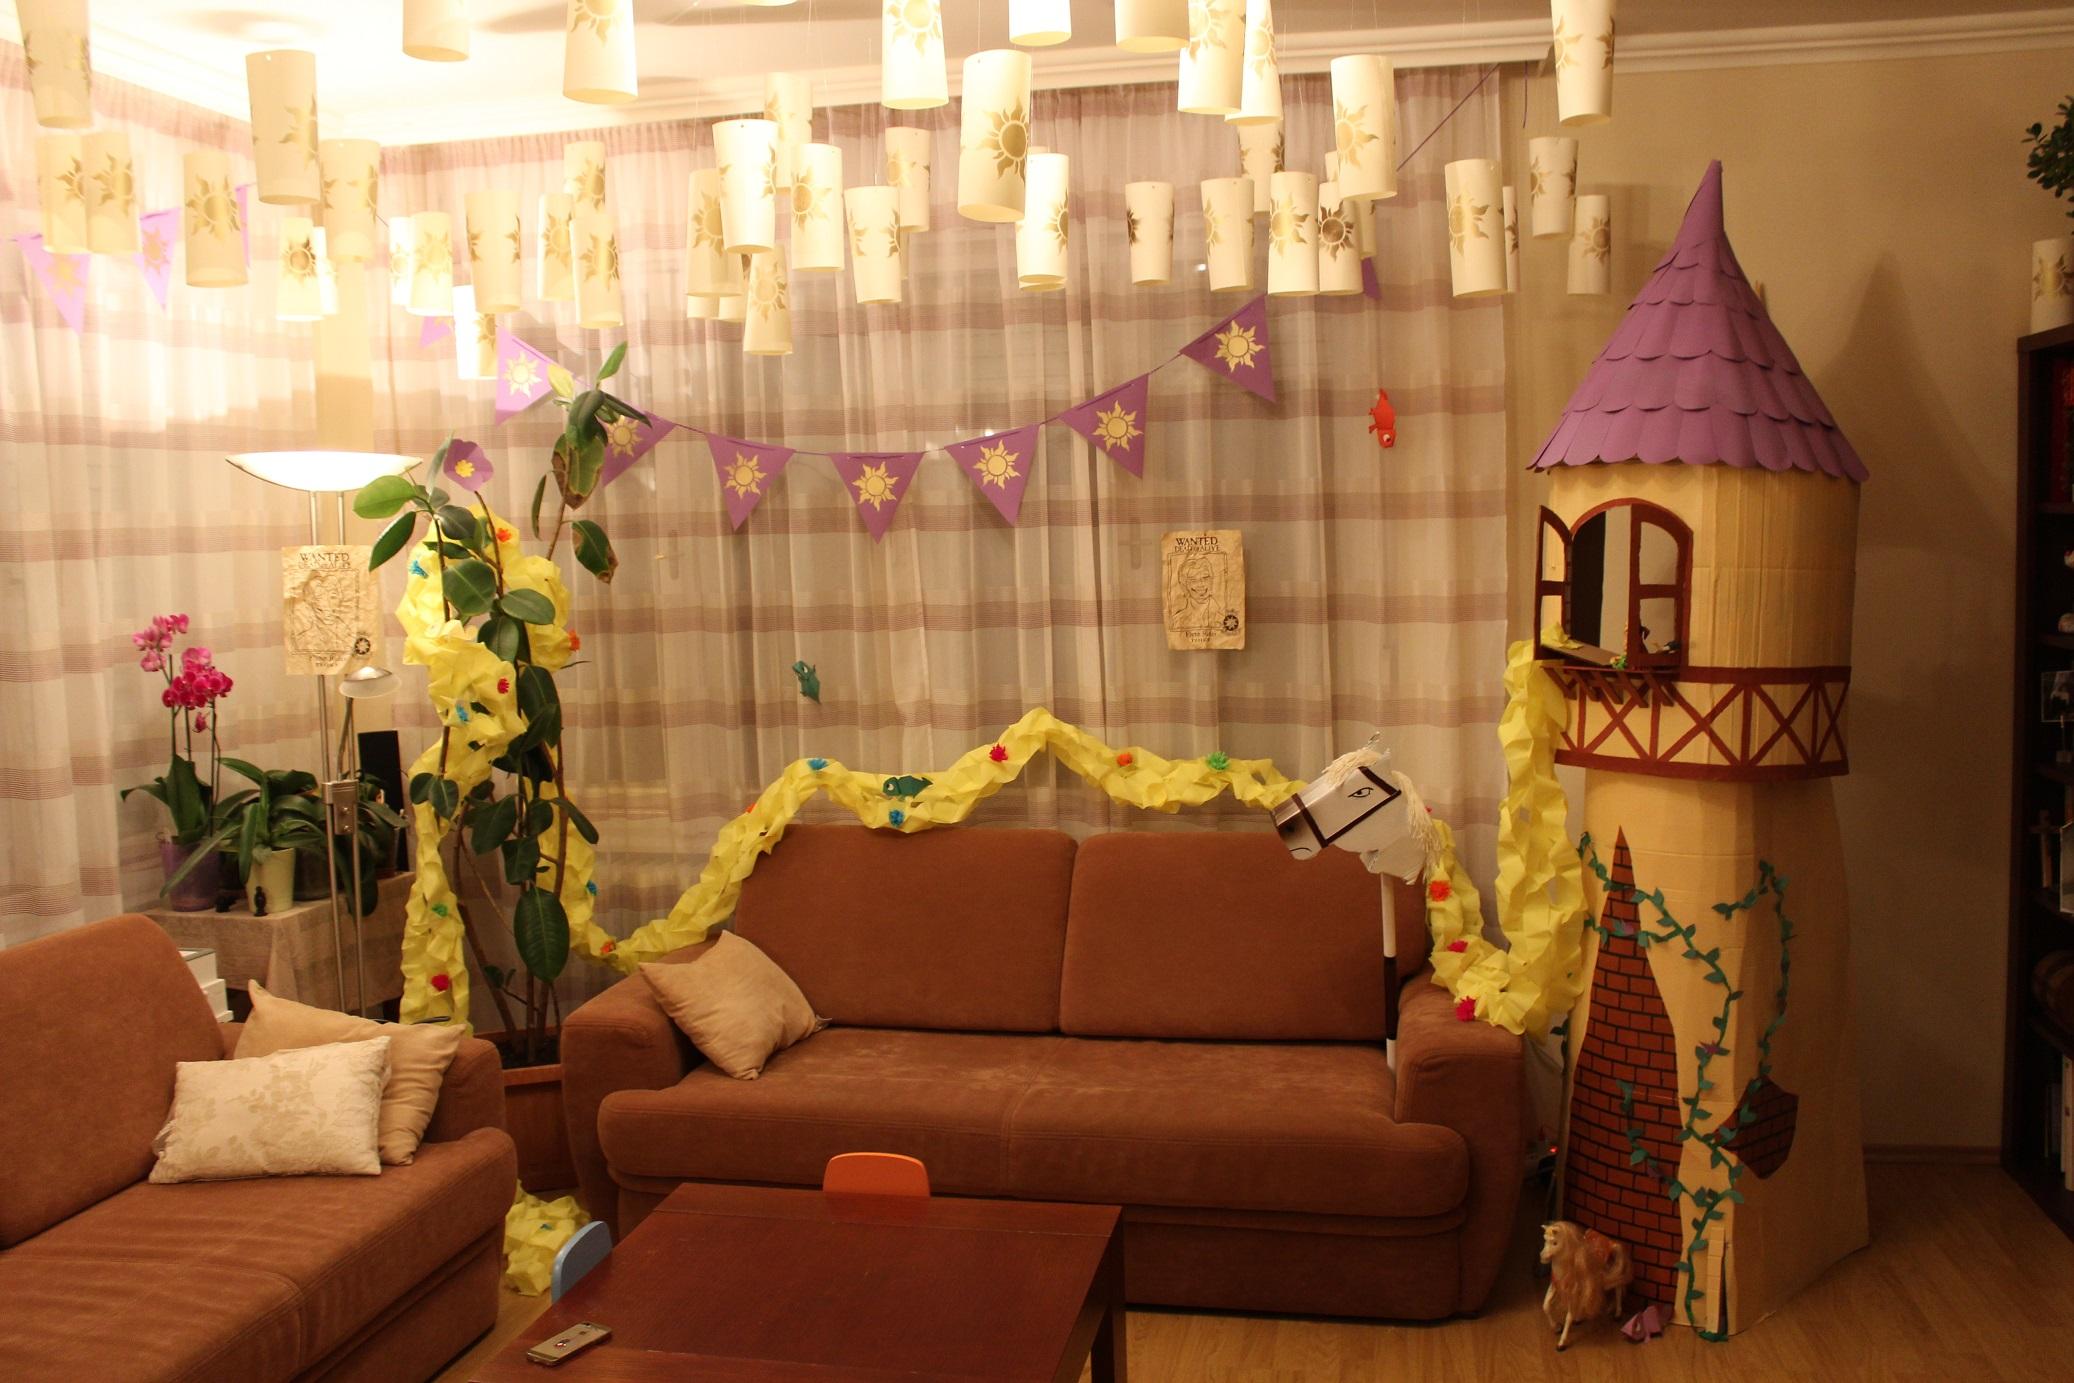 szmk_tangled_aranyhaj_birthday_party_szulinap_dekor_buli_2.JPG